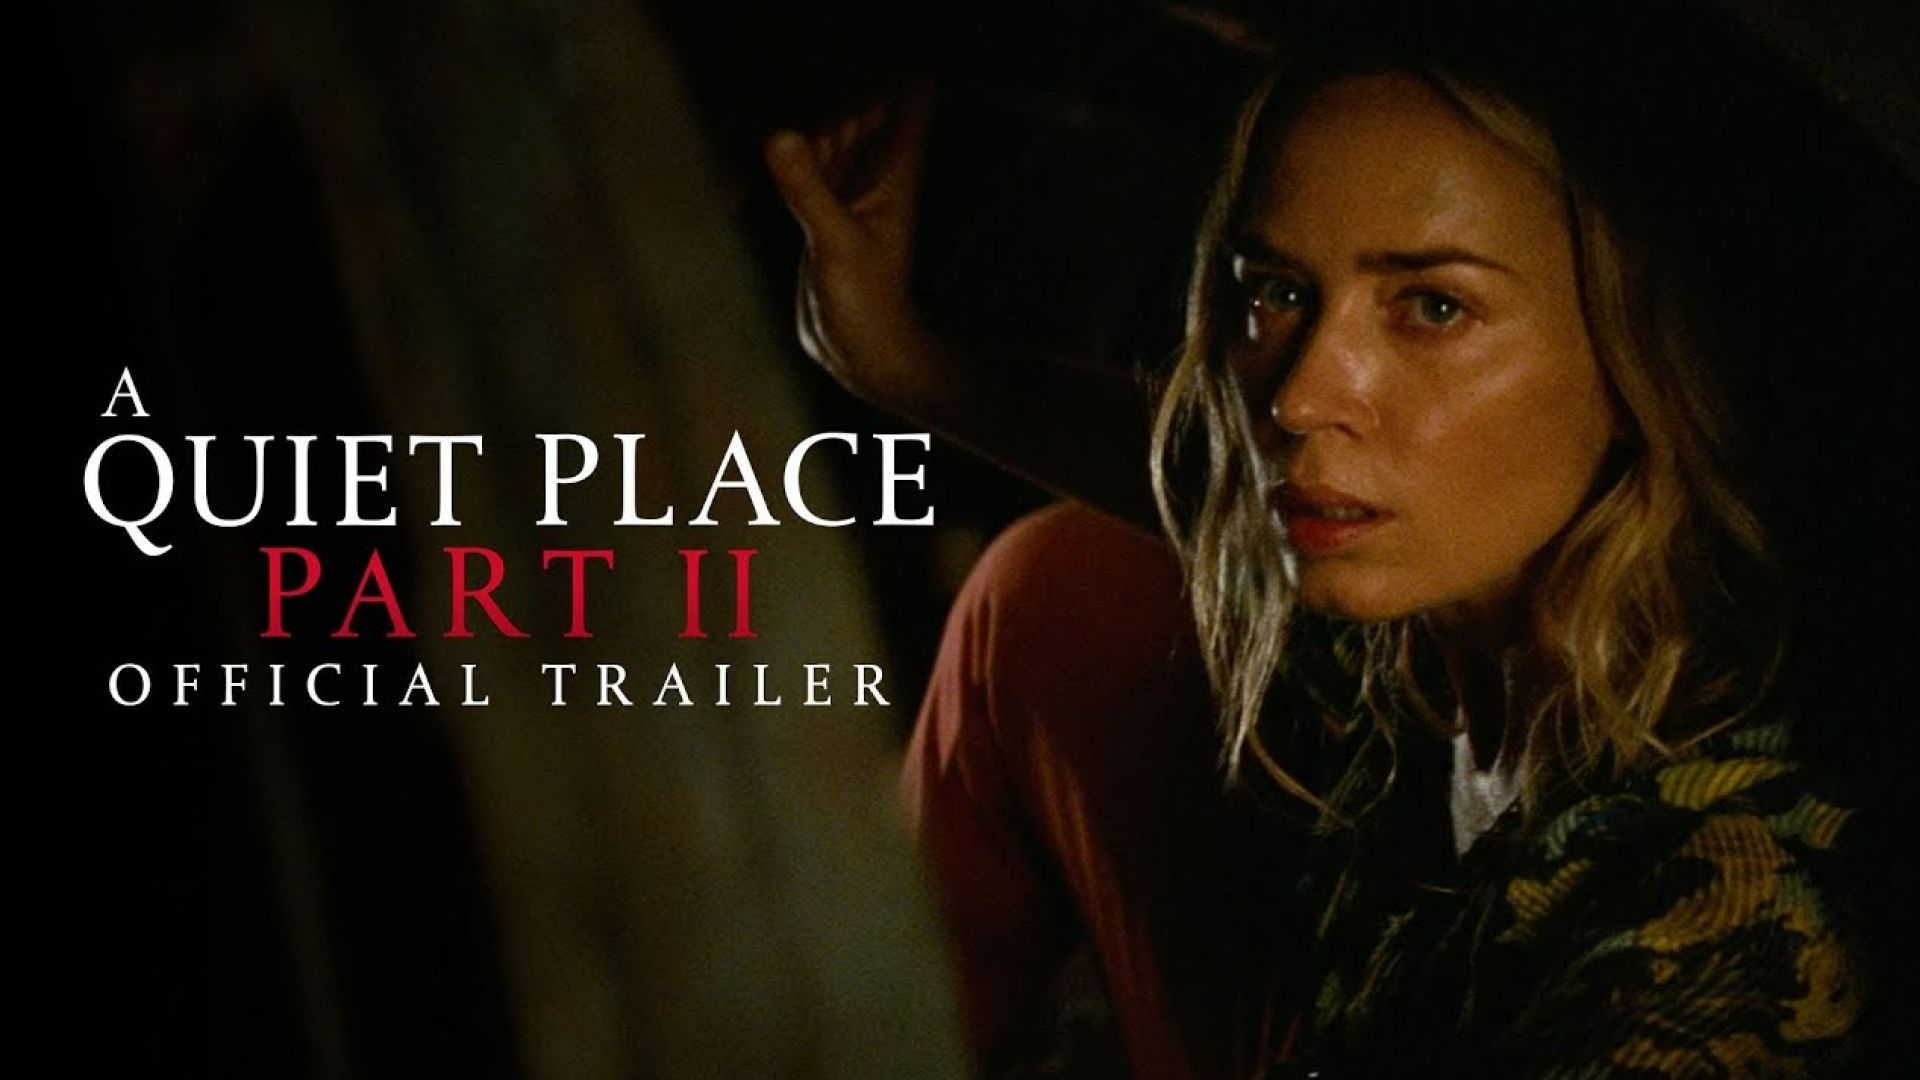 'A Quiet Place Part II' Official Trailer